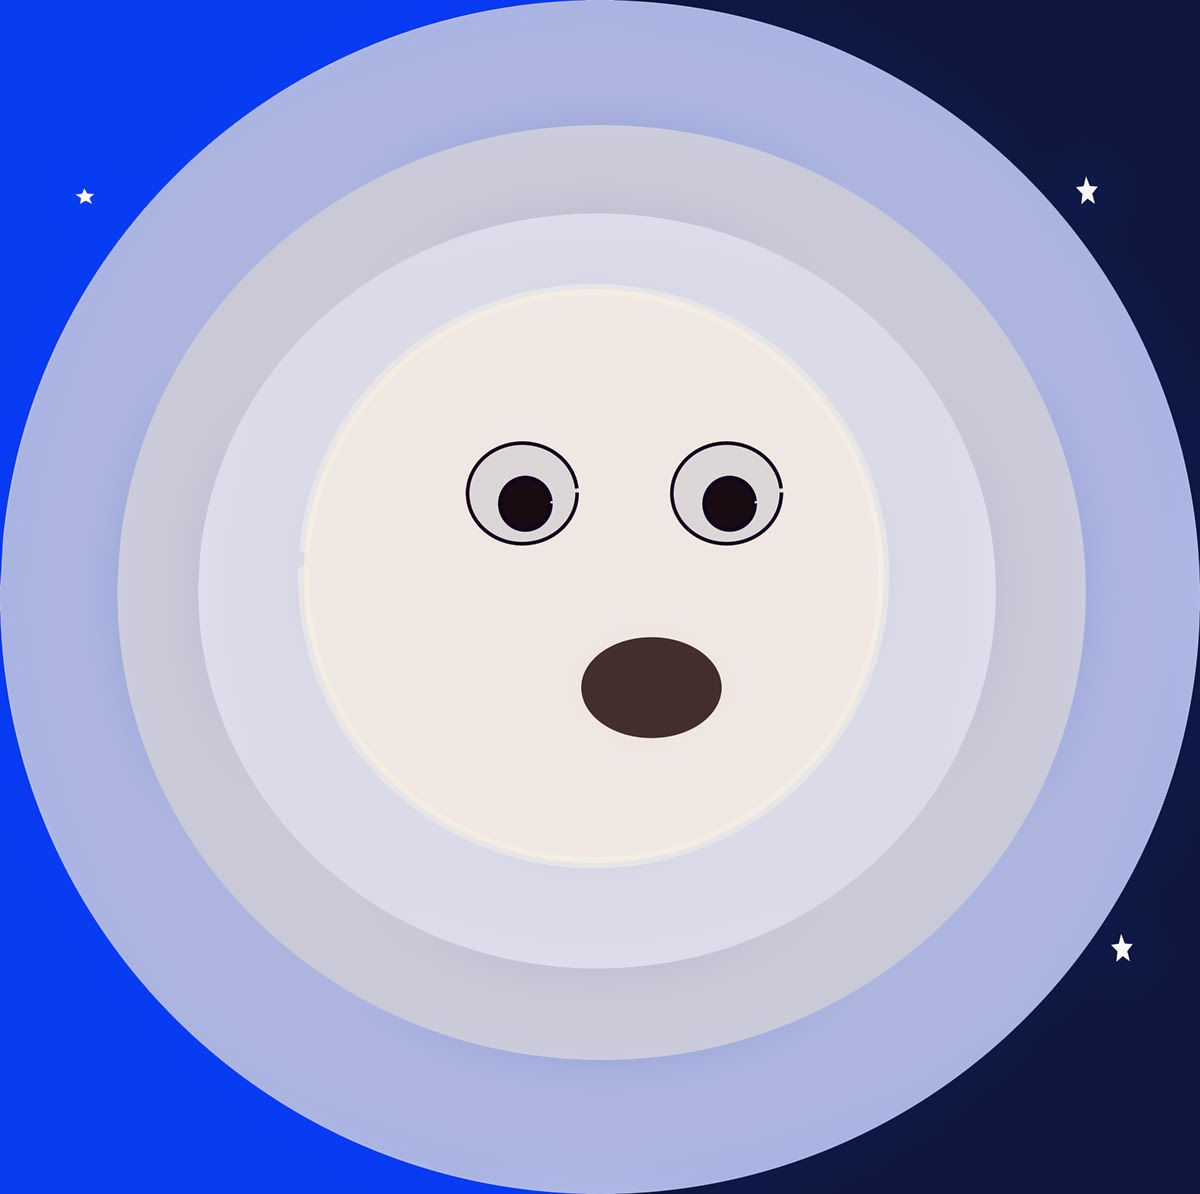 Moon, Luna, Lluna, Lune, Mond, 月亮